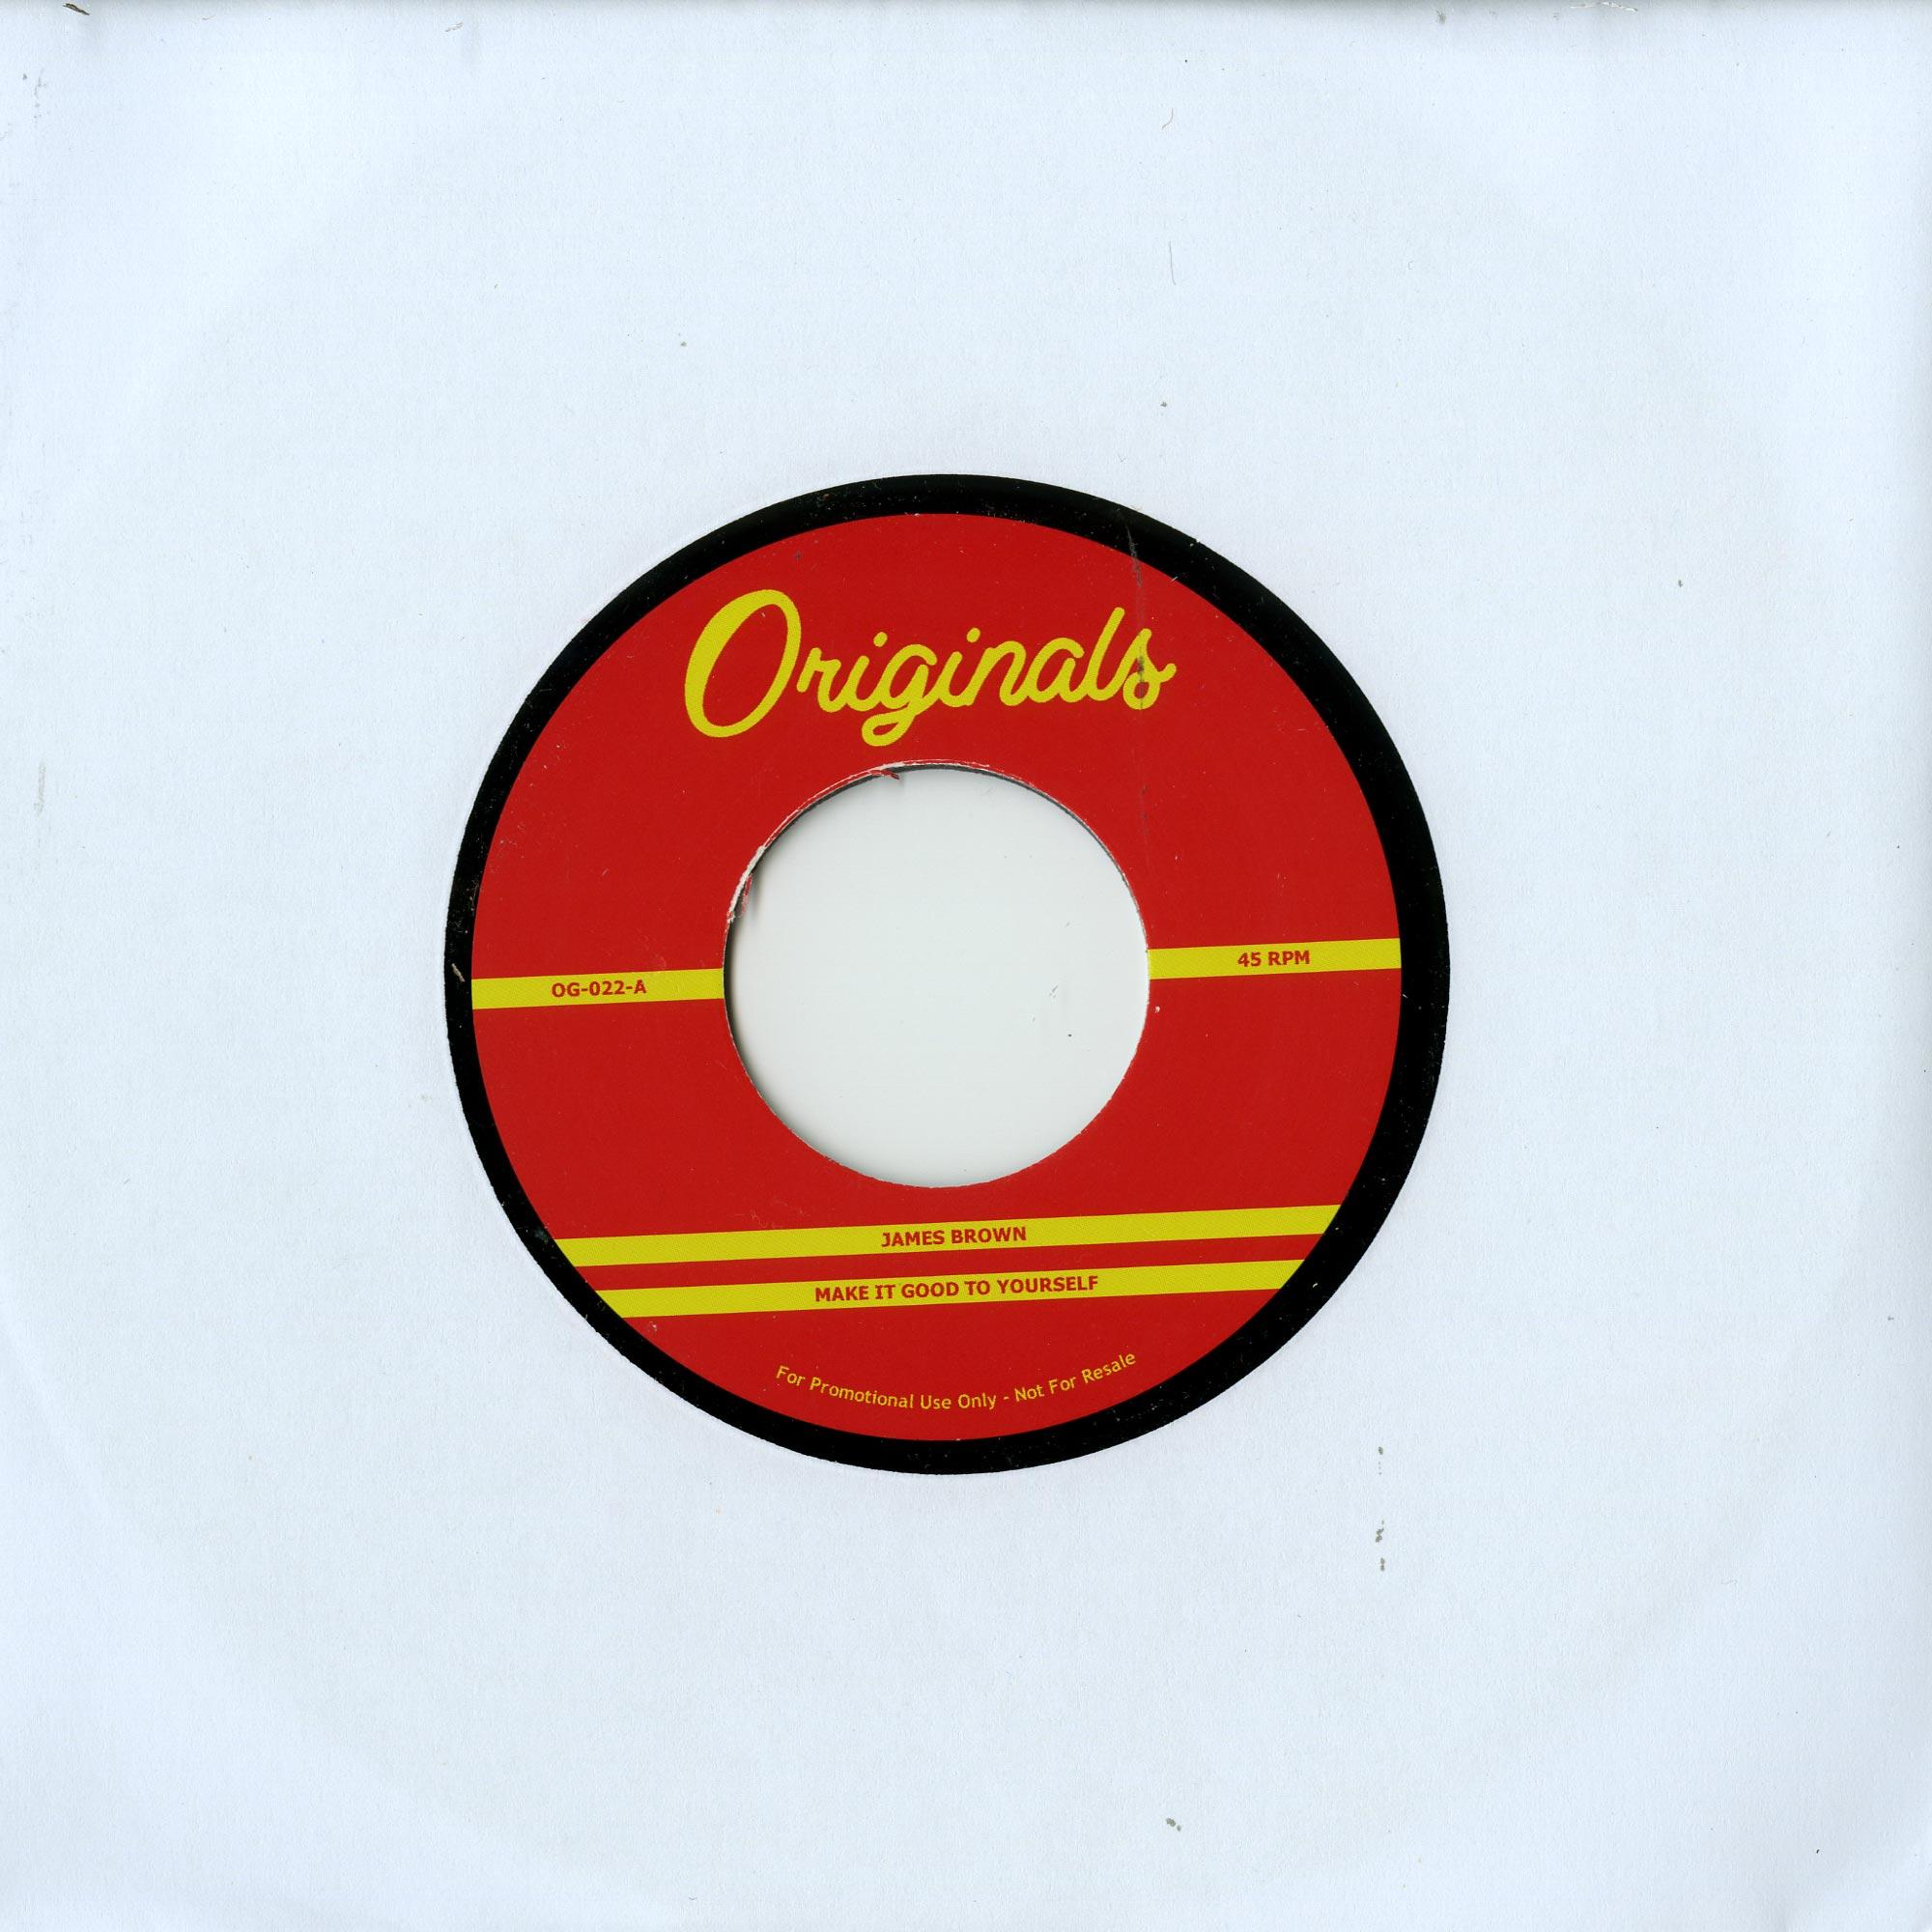 James Brown - MAKE IT GOOD TO YOOURSELF